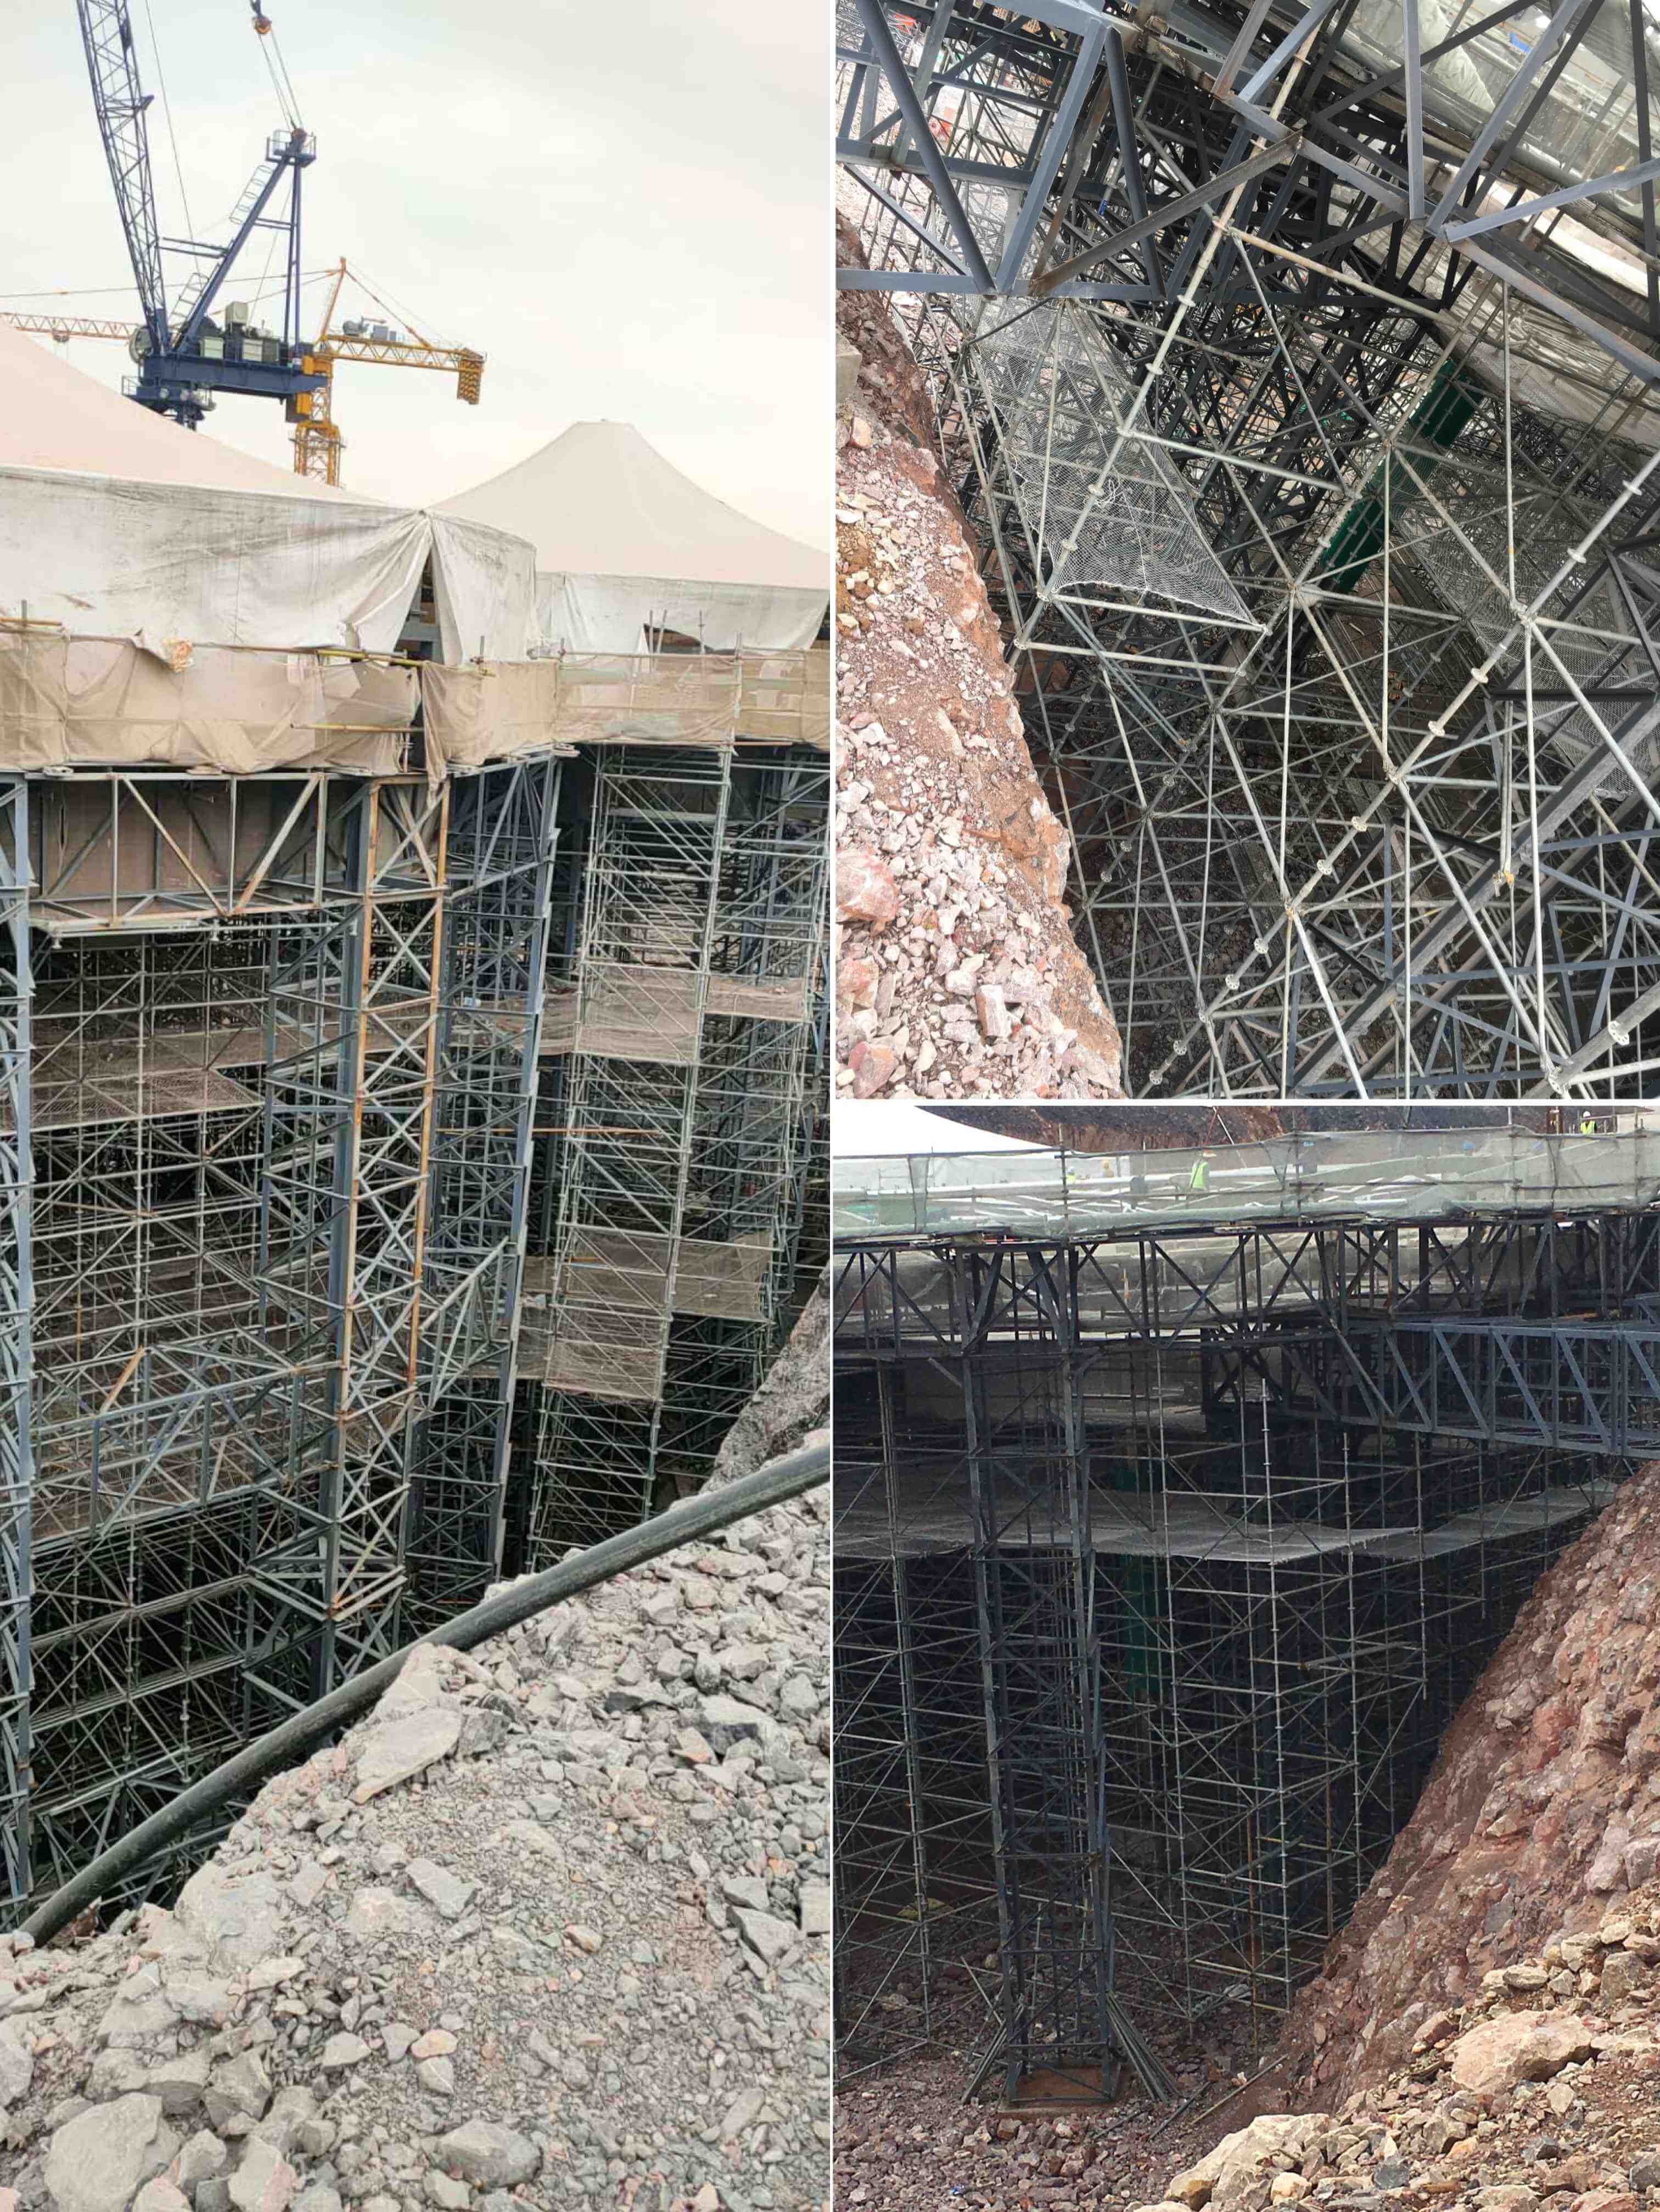 scaffolding under construction